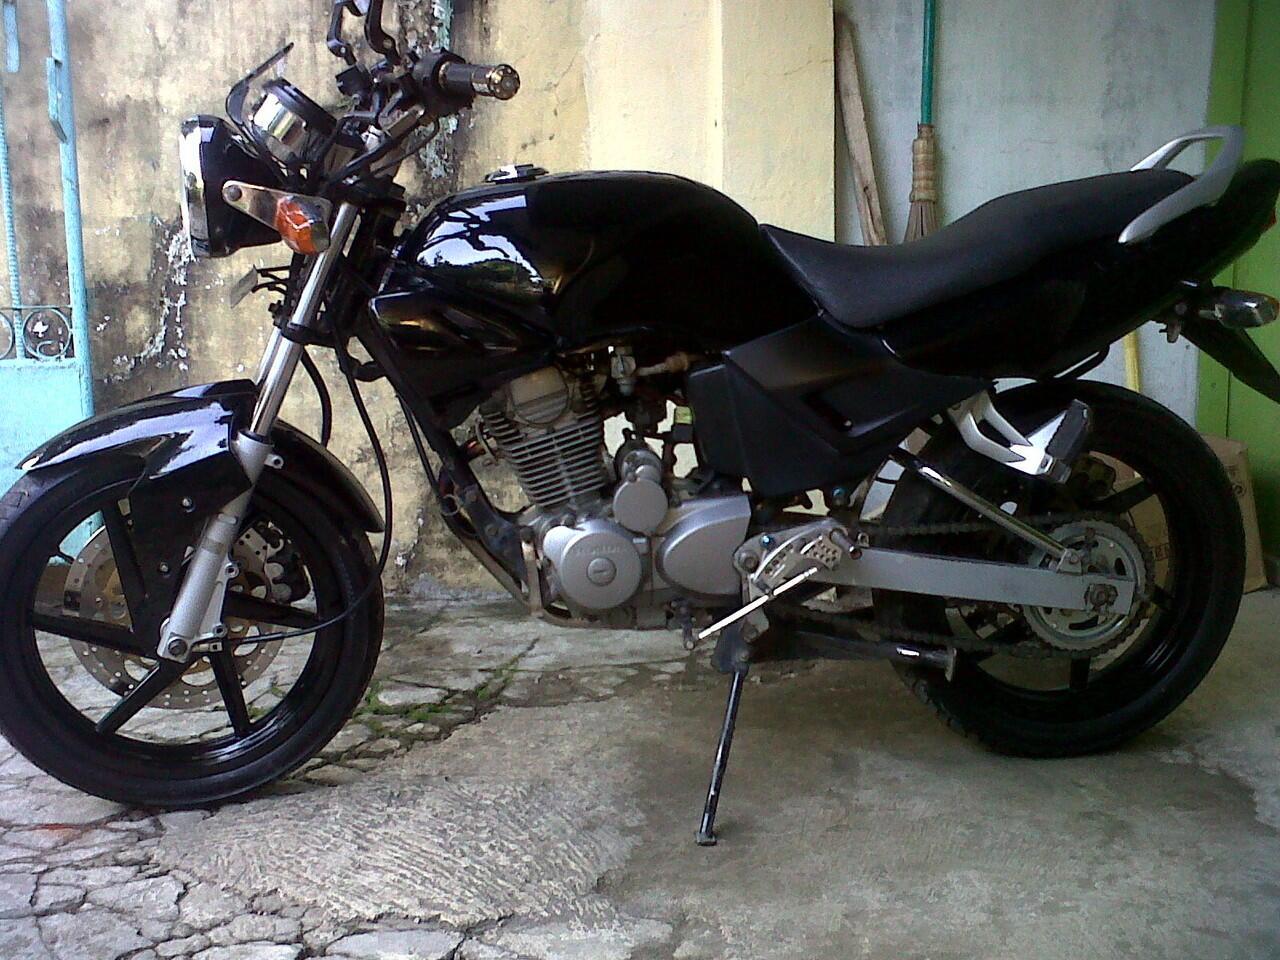 Cari Dijual Honda Tiger Modif 2002 Bandung KASKUS